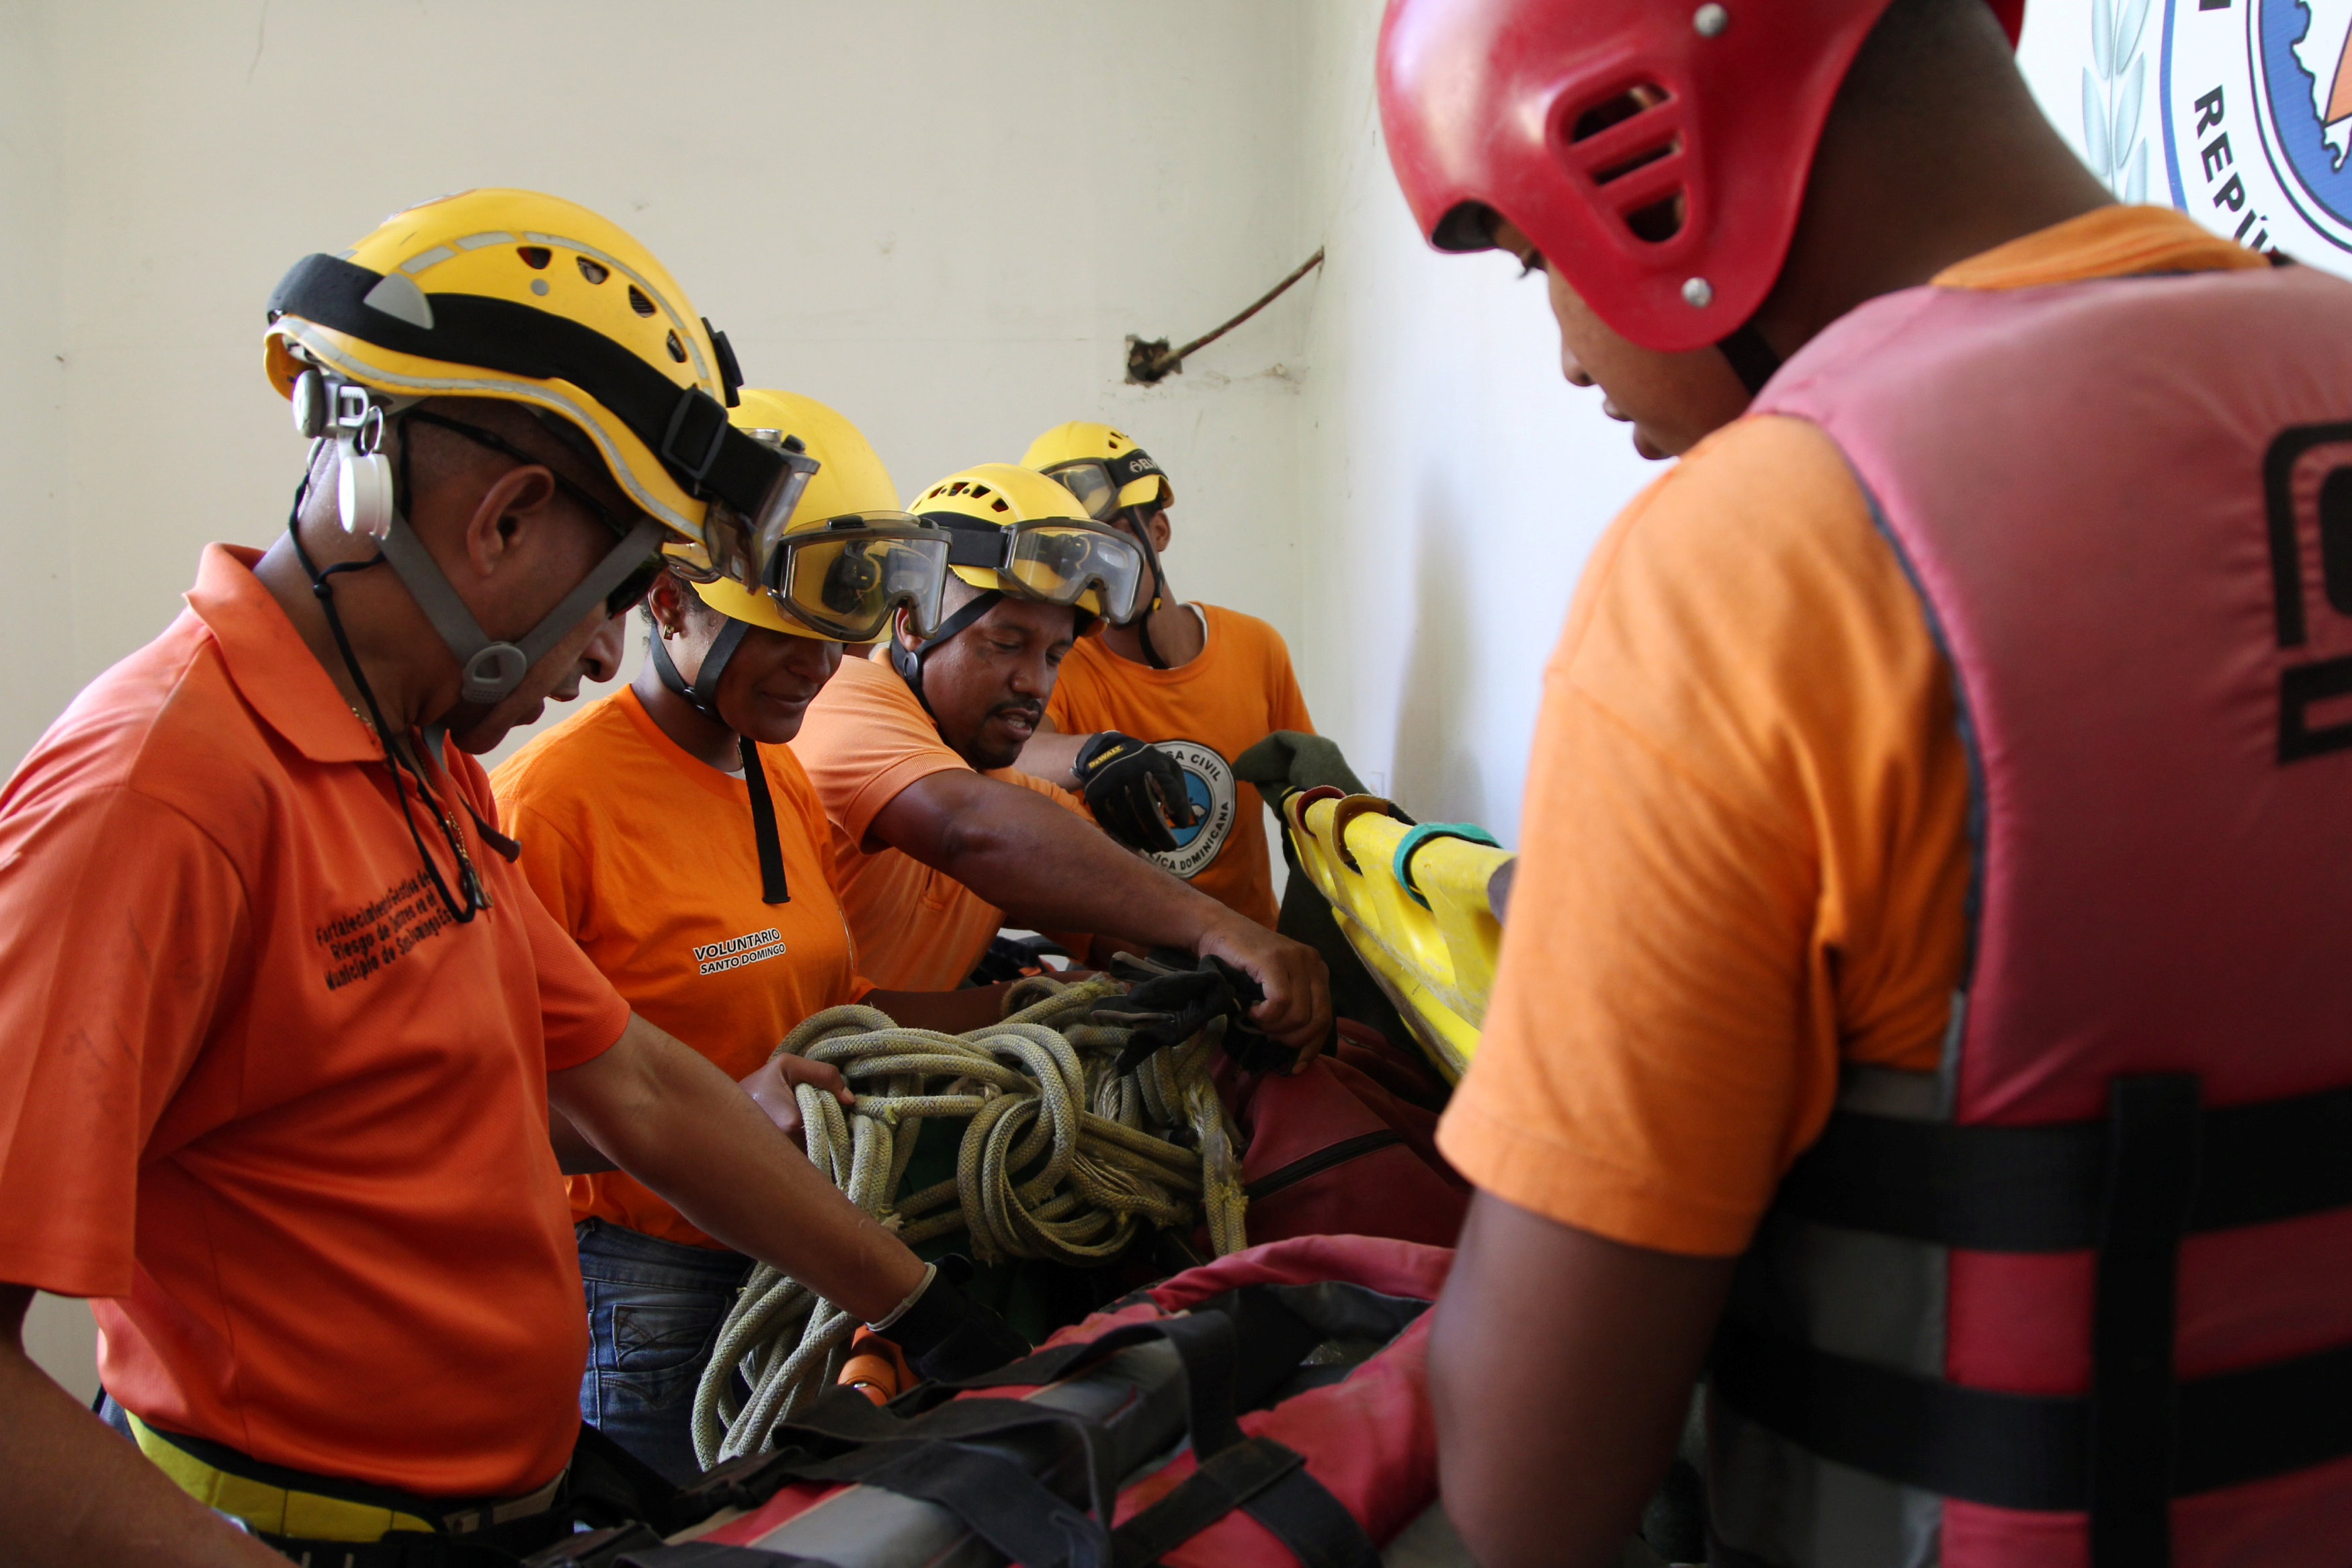 Members of the Civil Defense prepare their gear ahead of Hurricane Irma, in Santo Domingo, Dominican Republic on Sept. 5, 2017. (REUTERS/Ricardo Rojas)